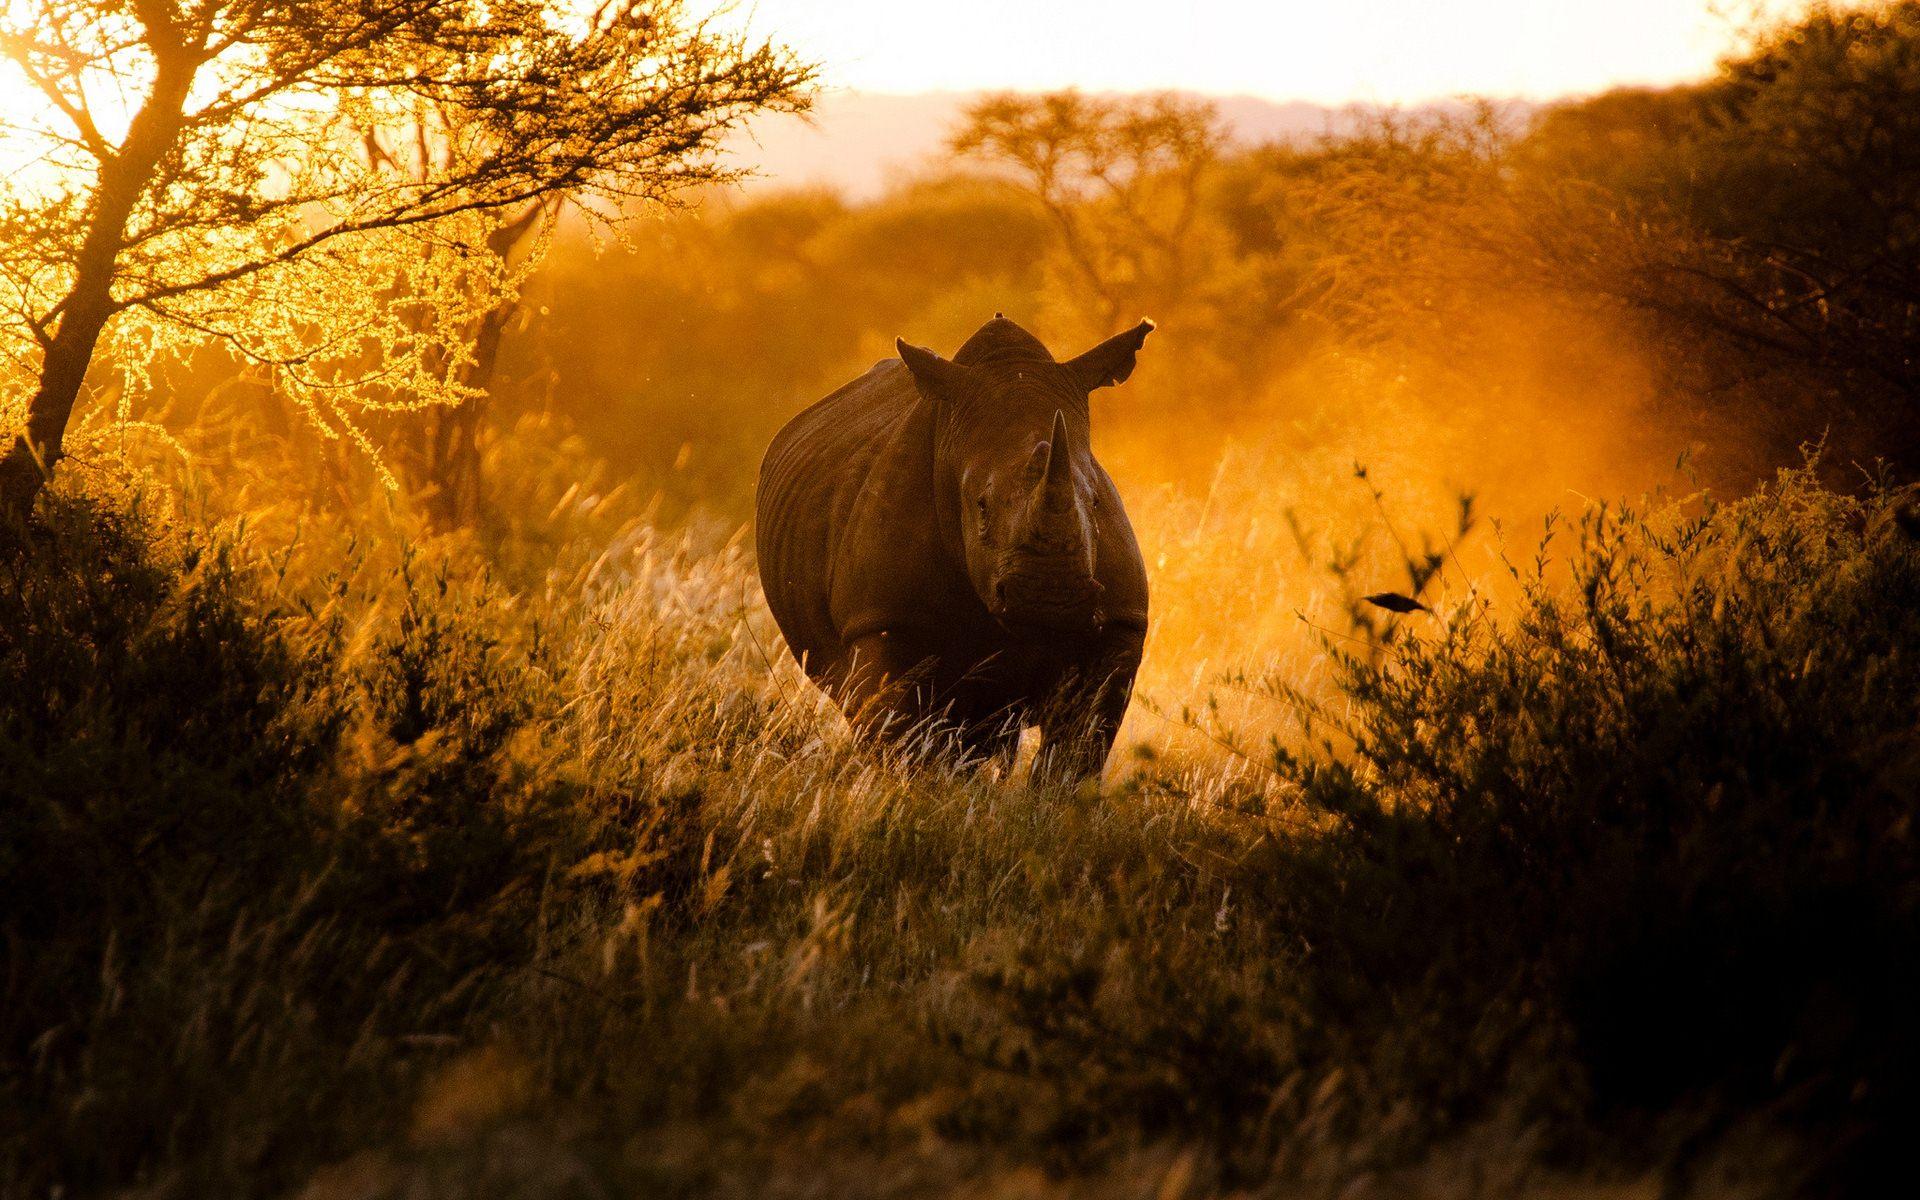 Rhino 3d Wallpaper Africa Wallpaper Hd Pixelstalk Net